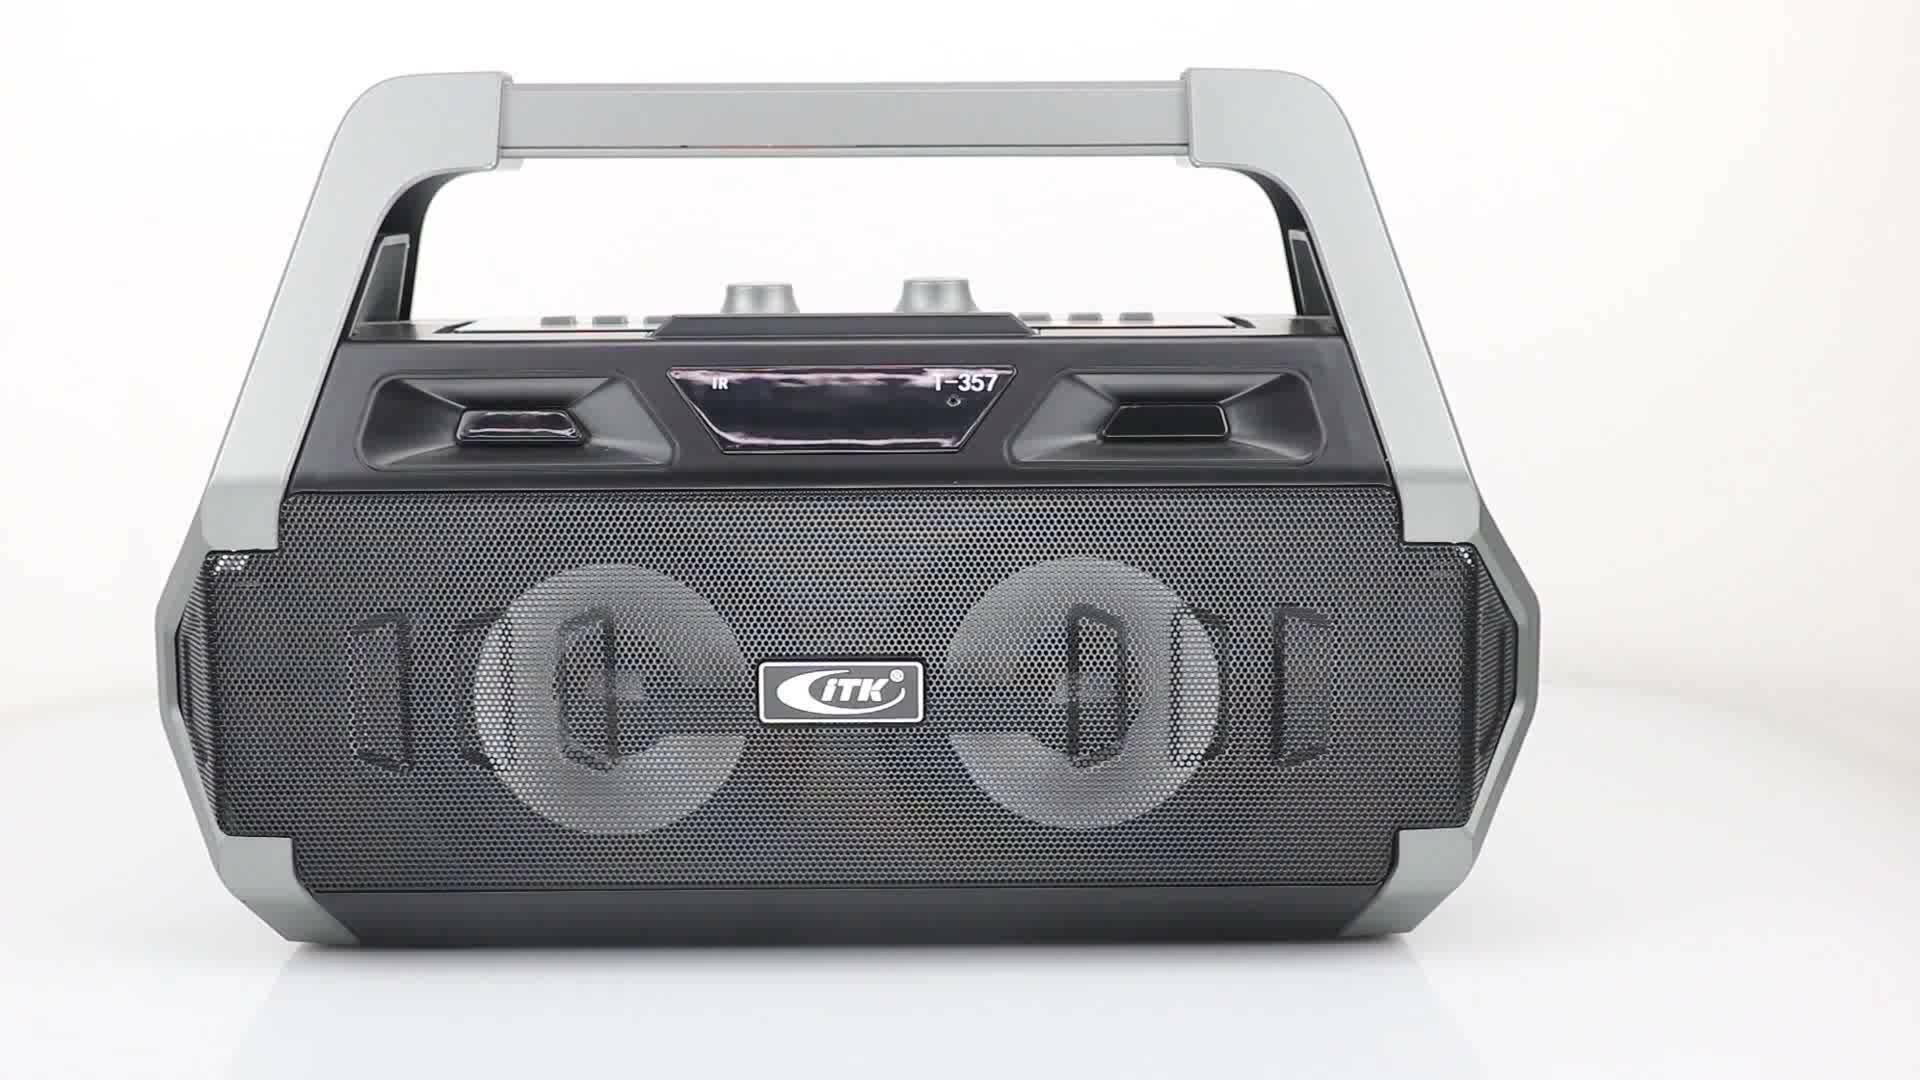 Anatel RSM BQB מאושר גאדג 'טים חכם WirelessMusic רמקולים טלפון מחשב X mini Bluetooth רמקולים